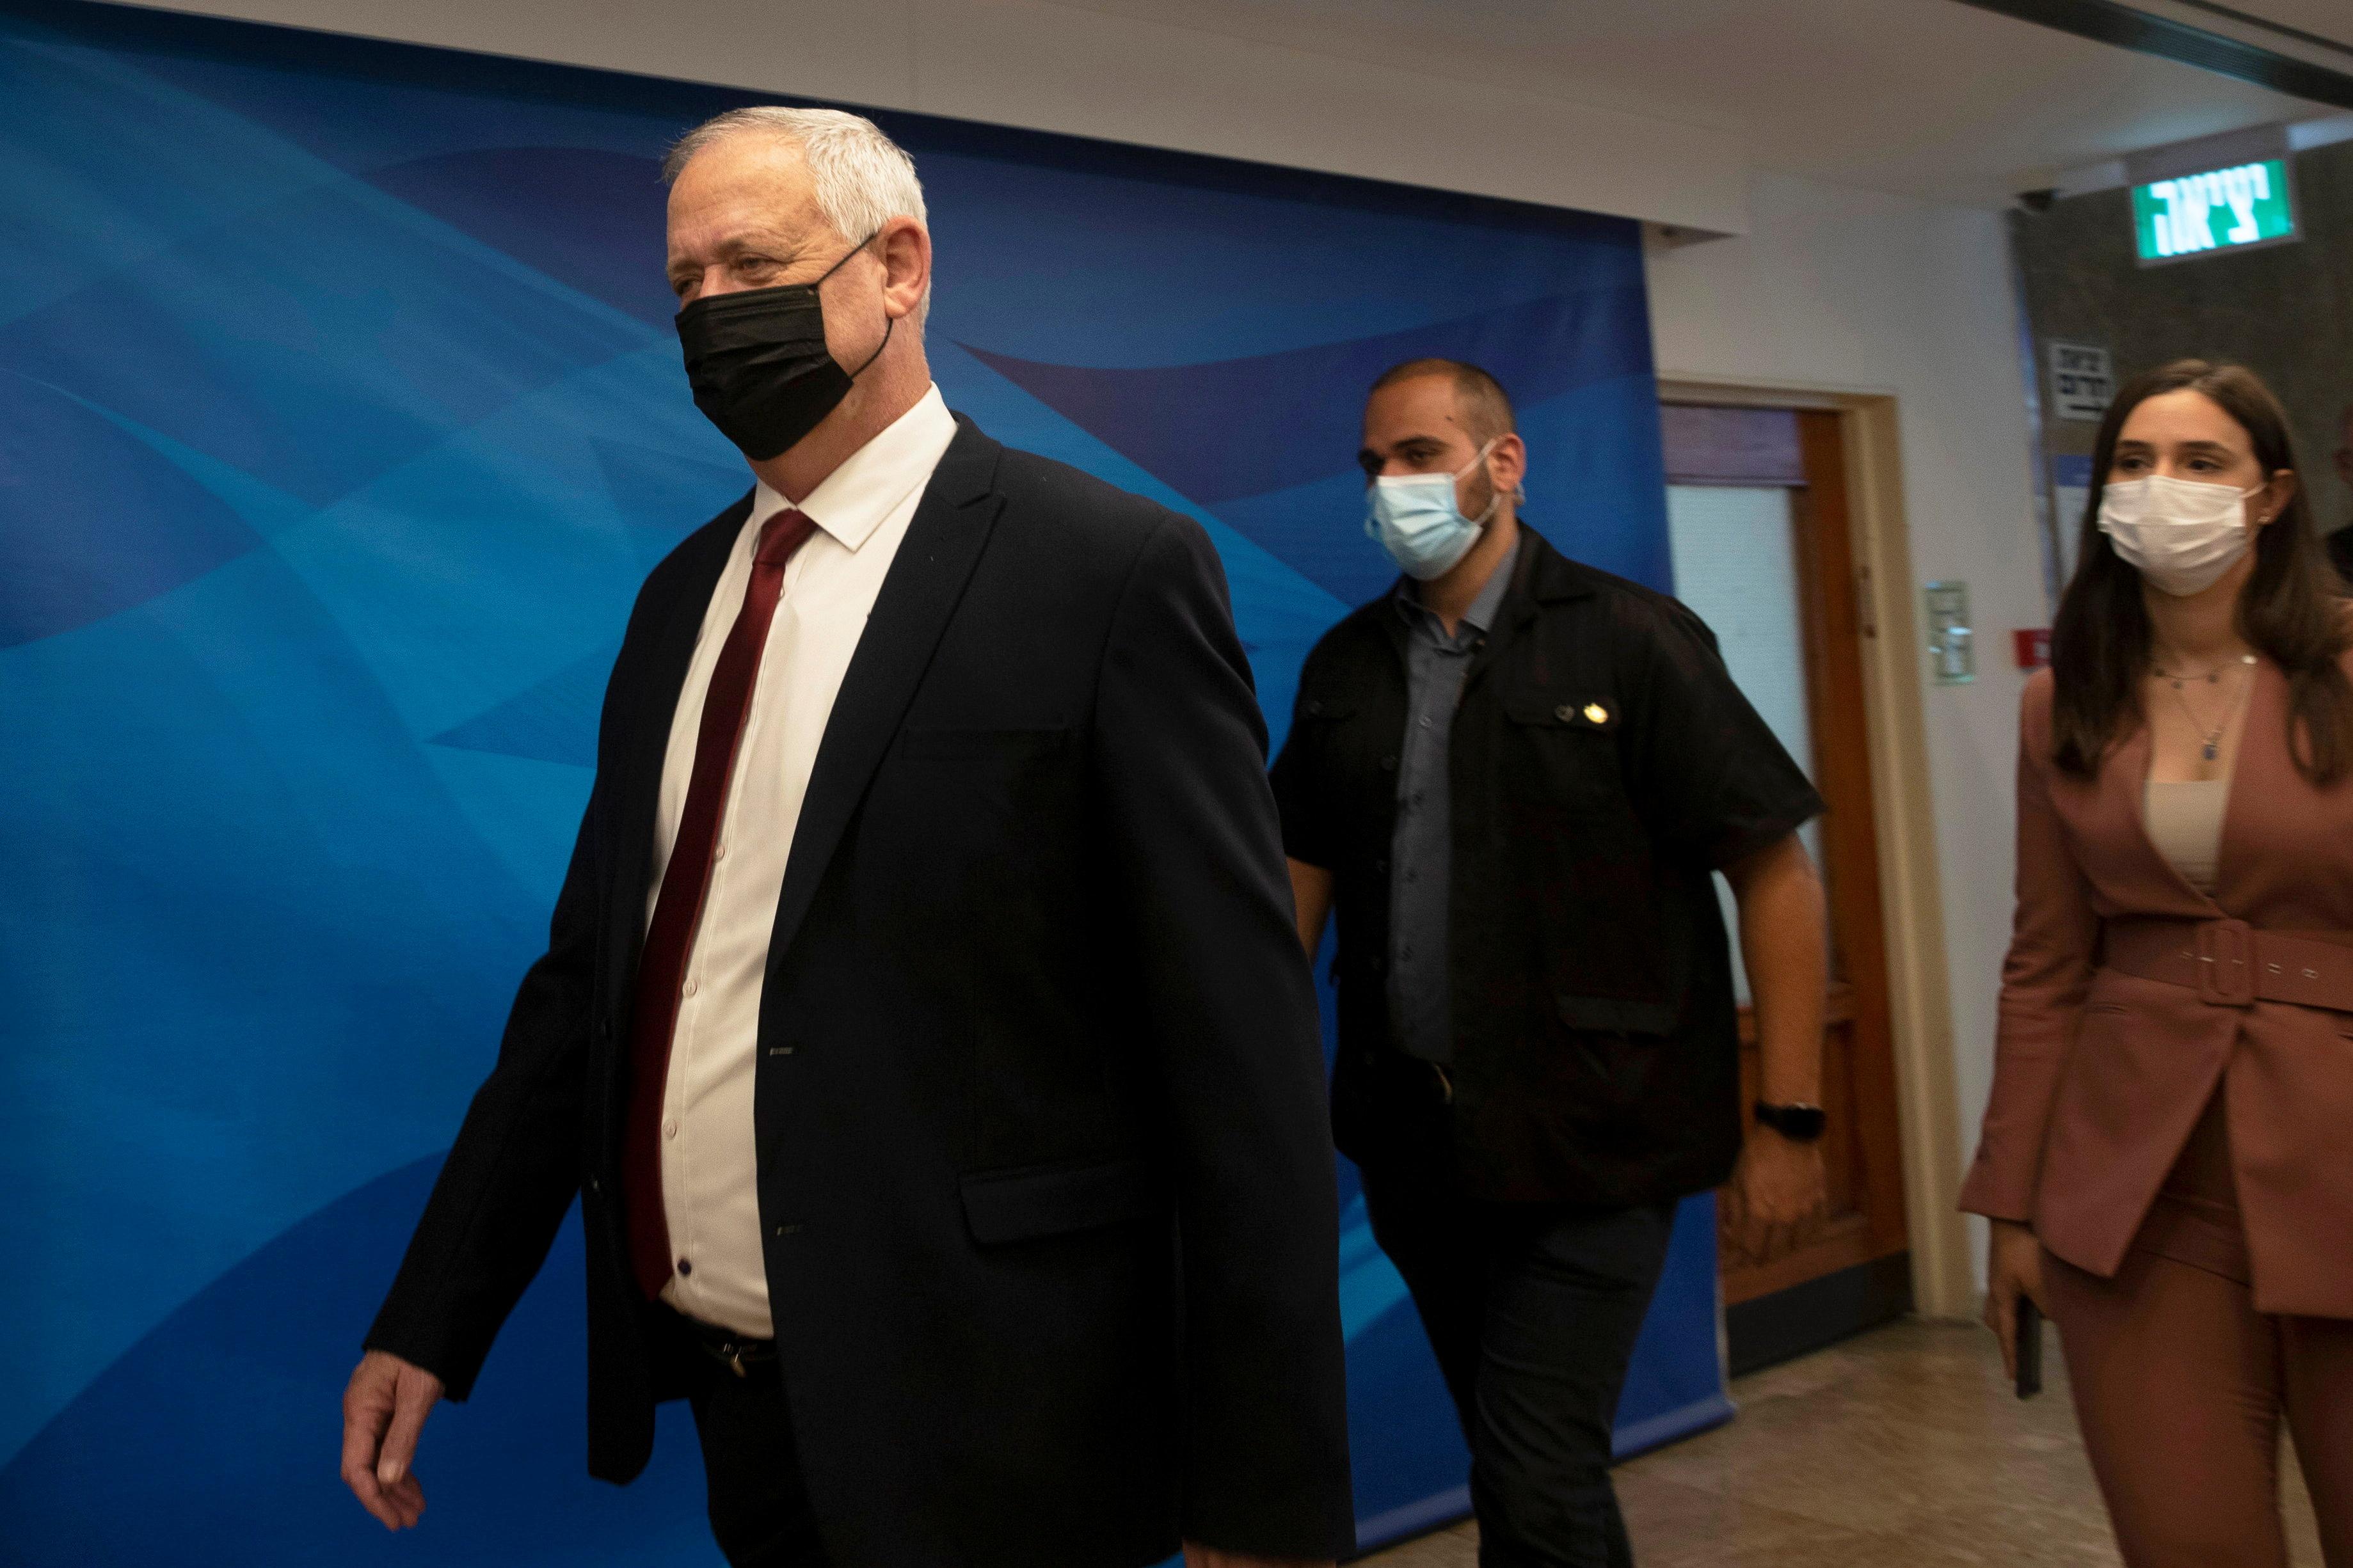 Israel's Minister of Defense Benny Gantz arrives for the weekly cabinet meeting in Jerusalem, June 27, 2021. Maya Alleruzzo/Pool via REUTERS/File Photo